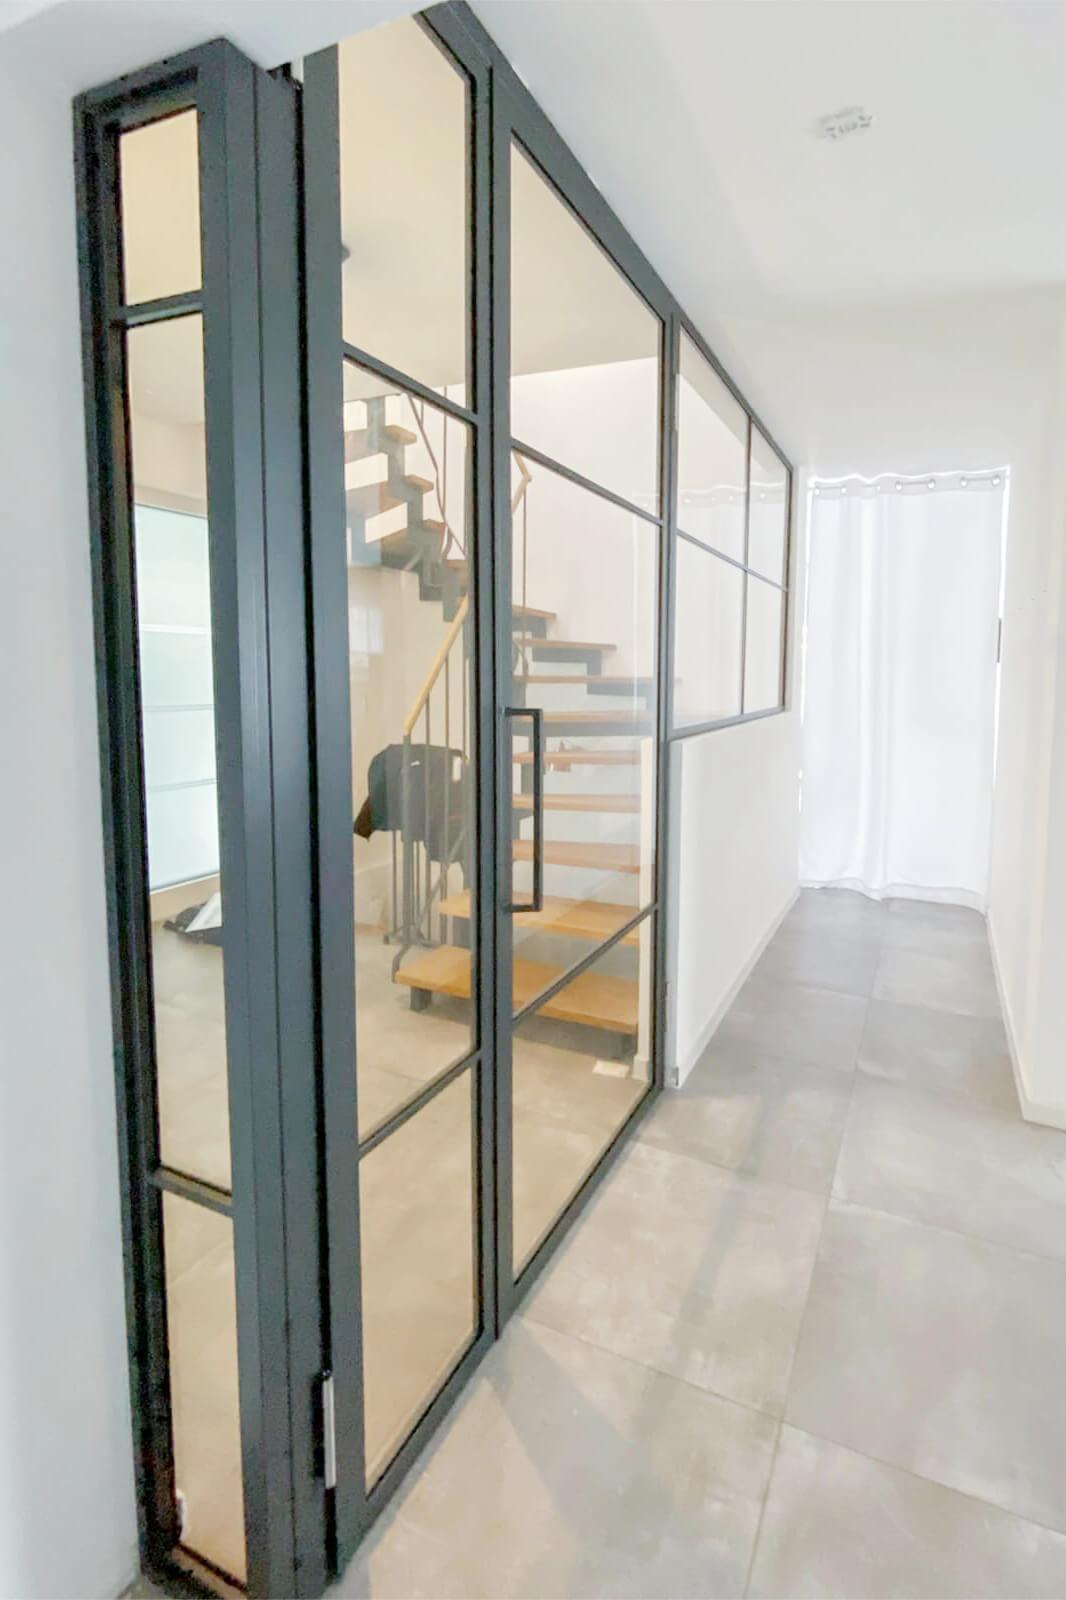 Loftstahl Loft-Stahl, N51E12, Stahl-Loft-Türen, Designtüren, Drehtür, Loftür, loftdoor